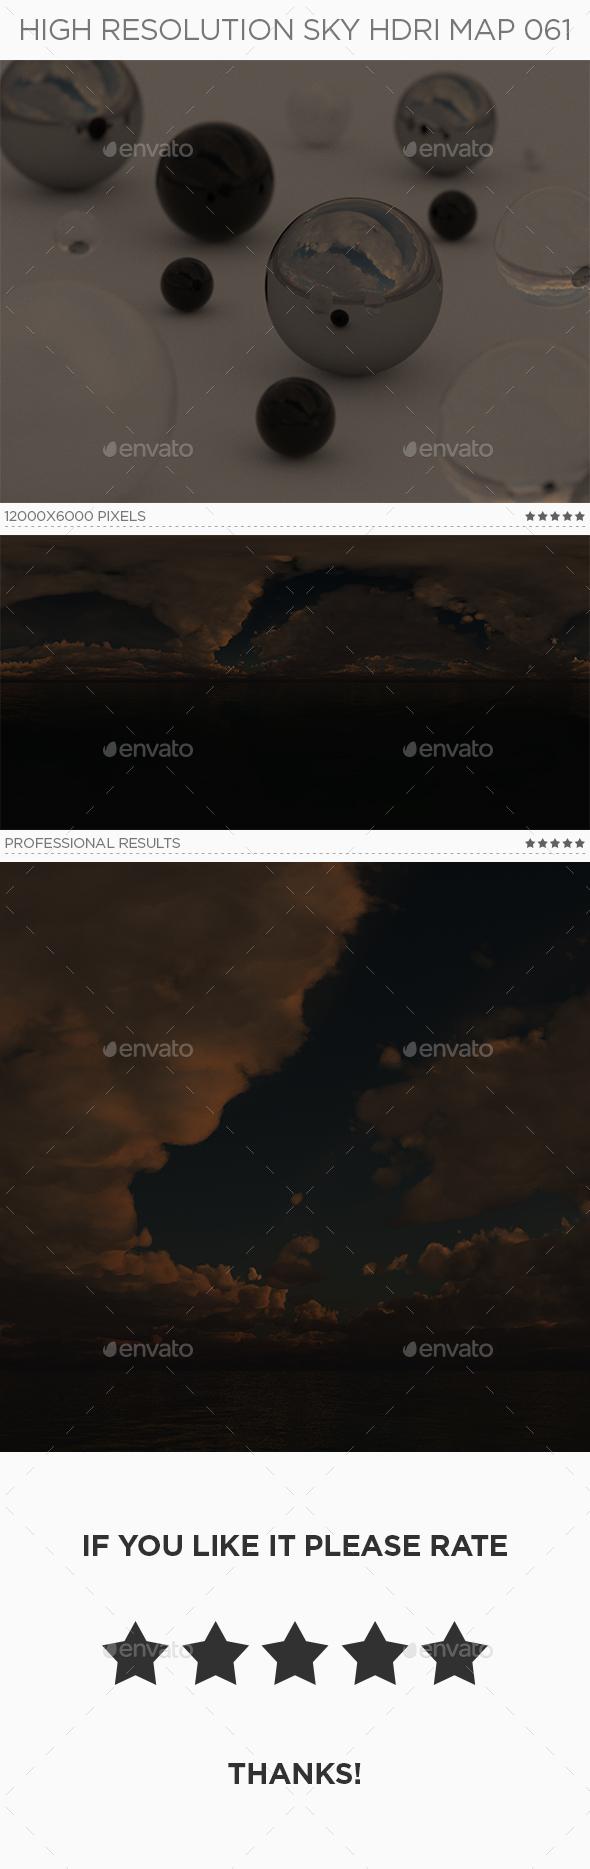 High Resolution Sky HDRi Map 061 - 3DOcean Item for Sale